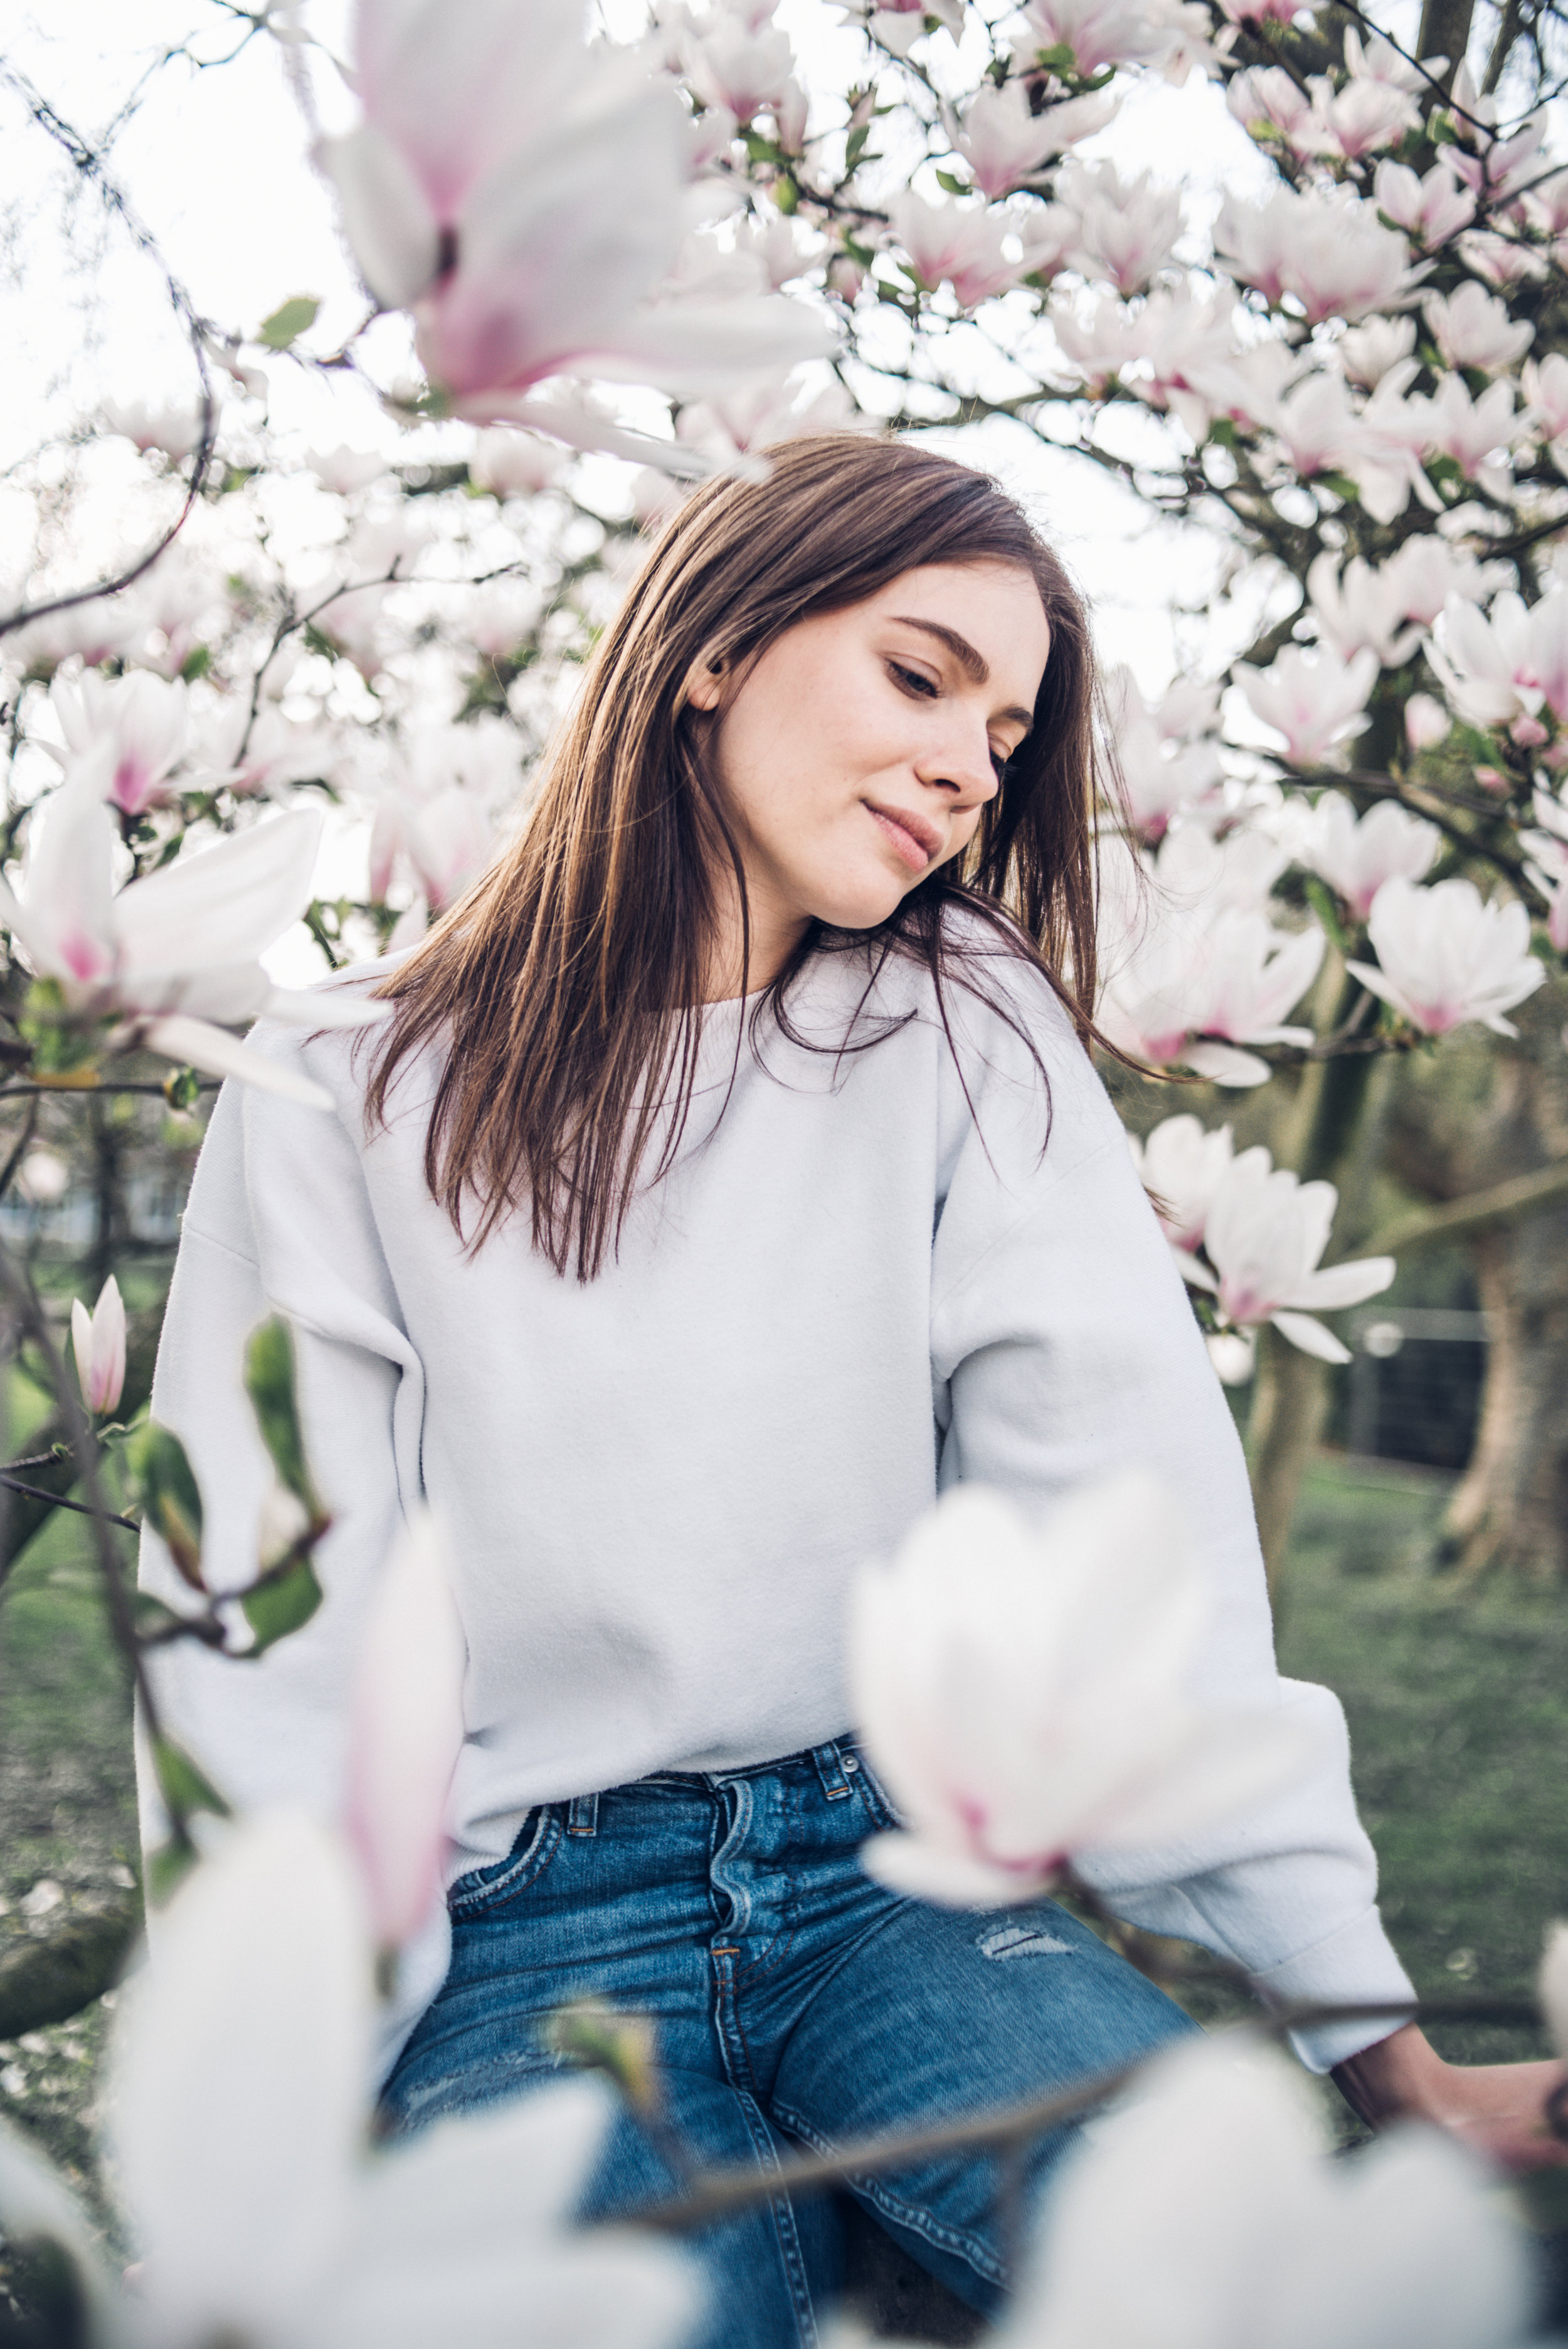 magnolia-shooting-münster-spring-gretacaptures